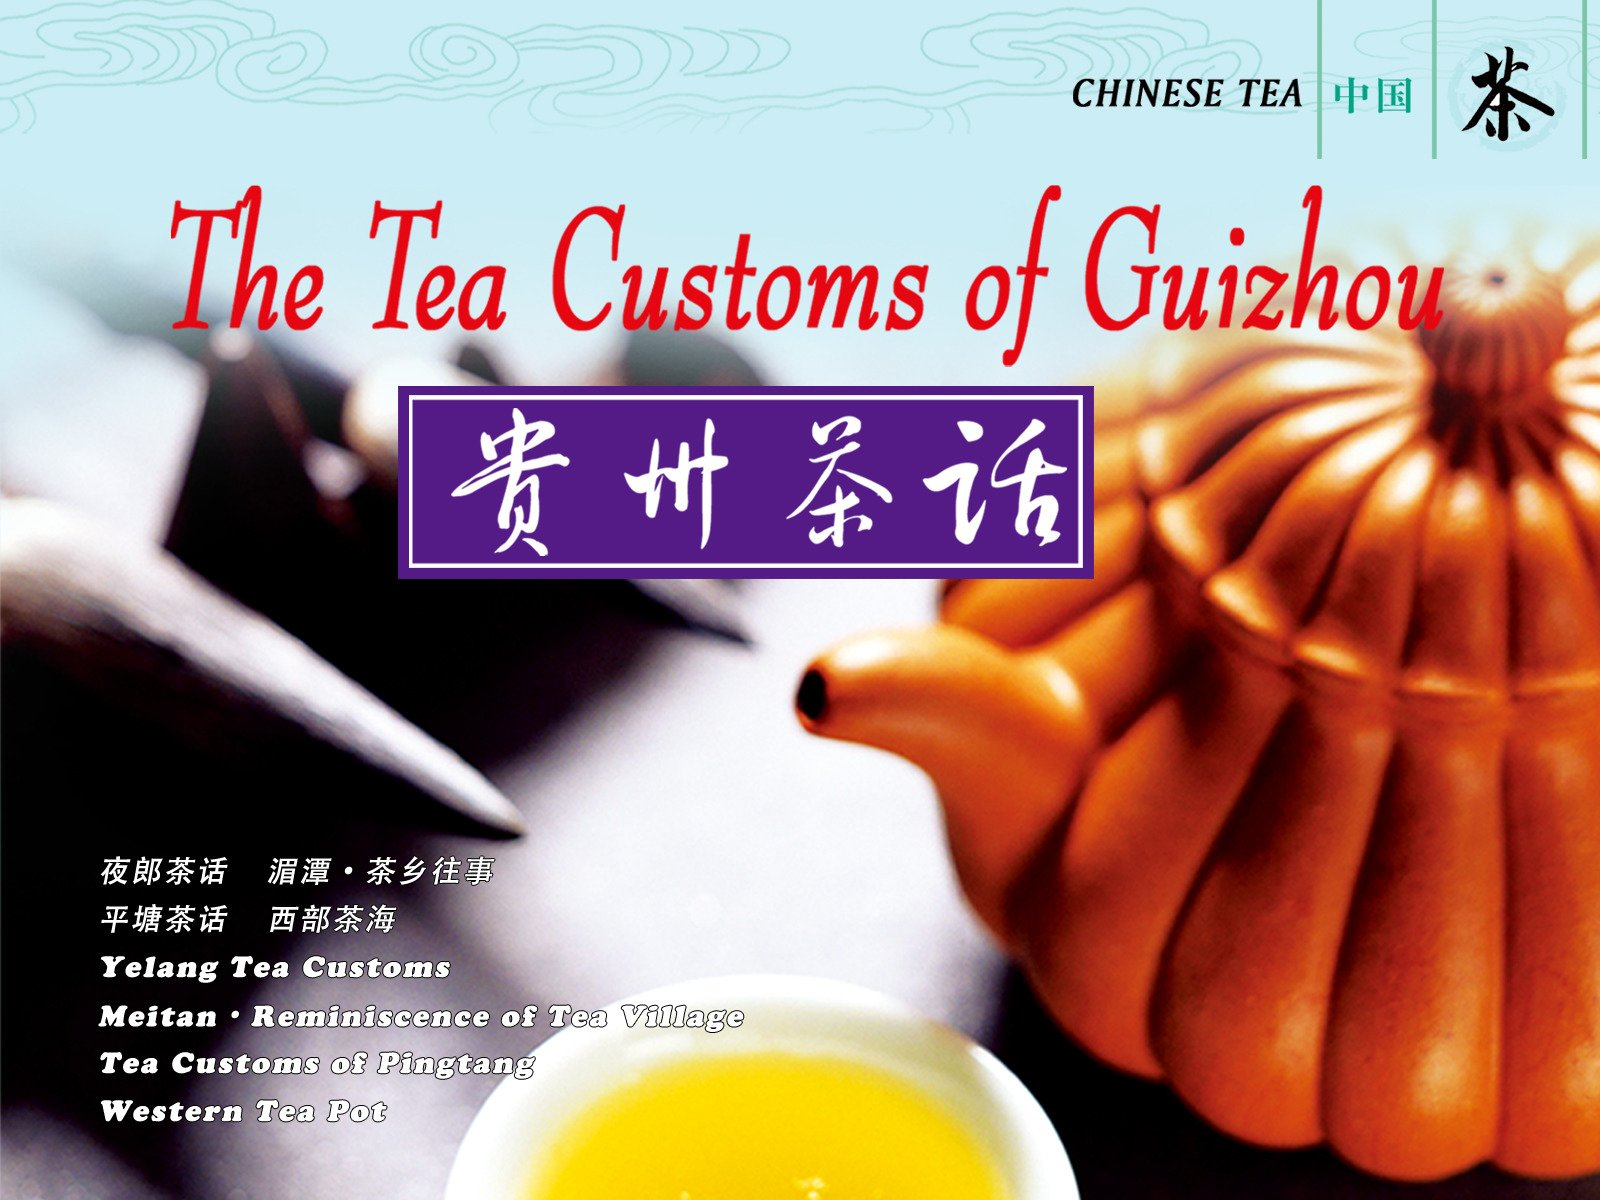 The Tea Customs of Guizhou - Season 1